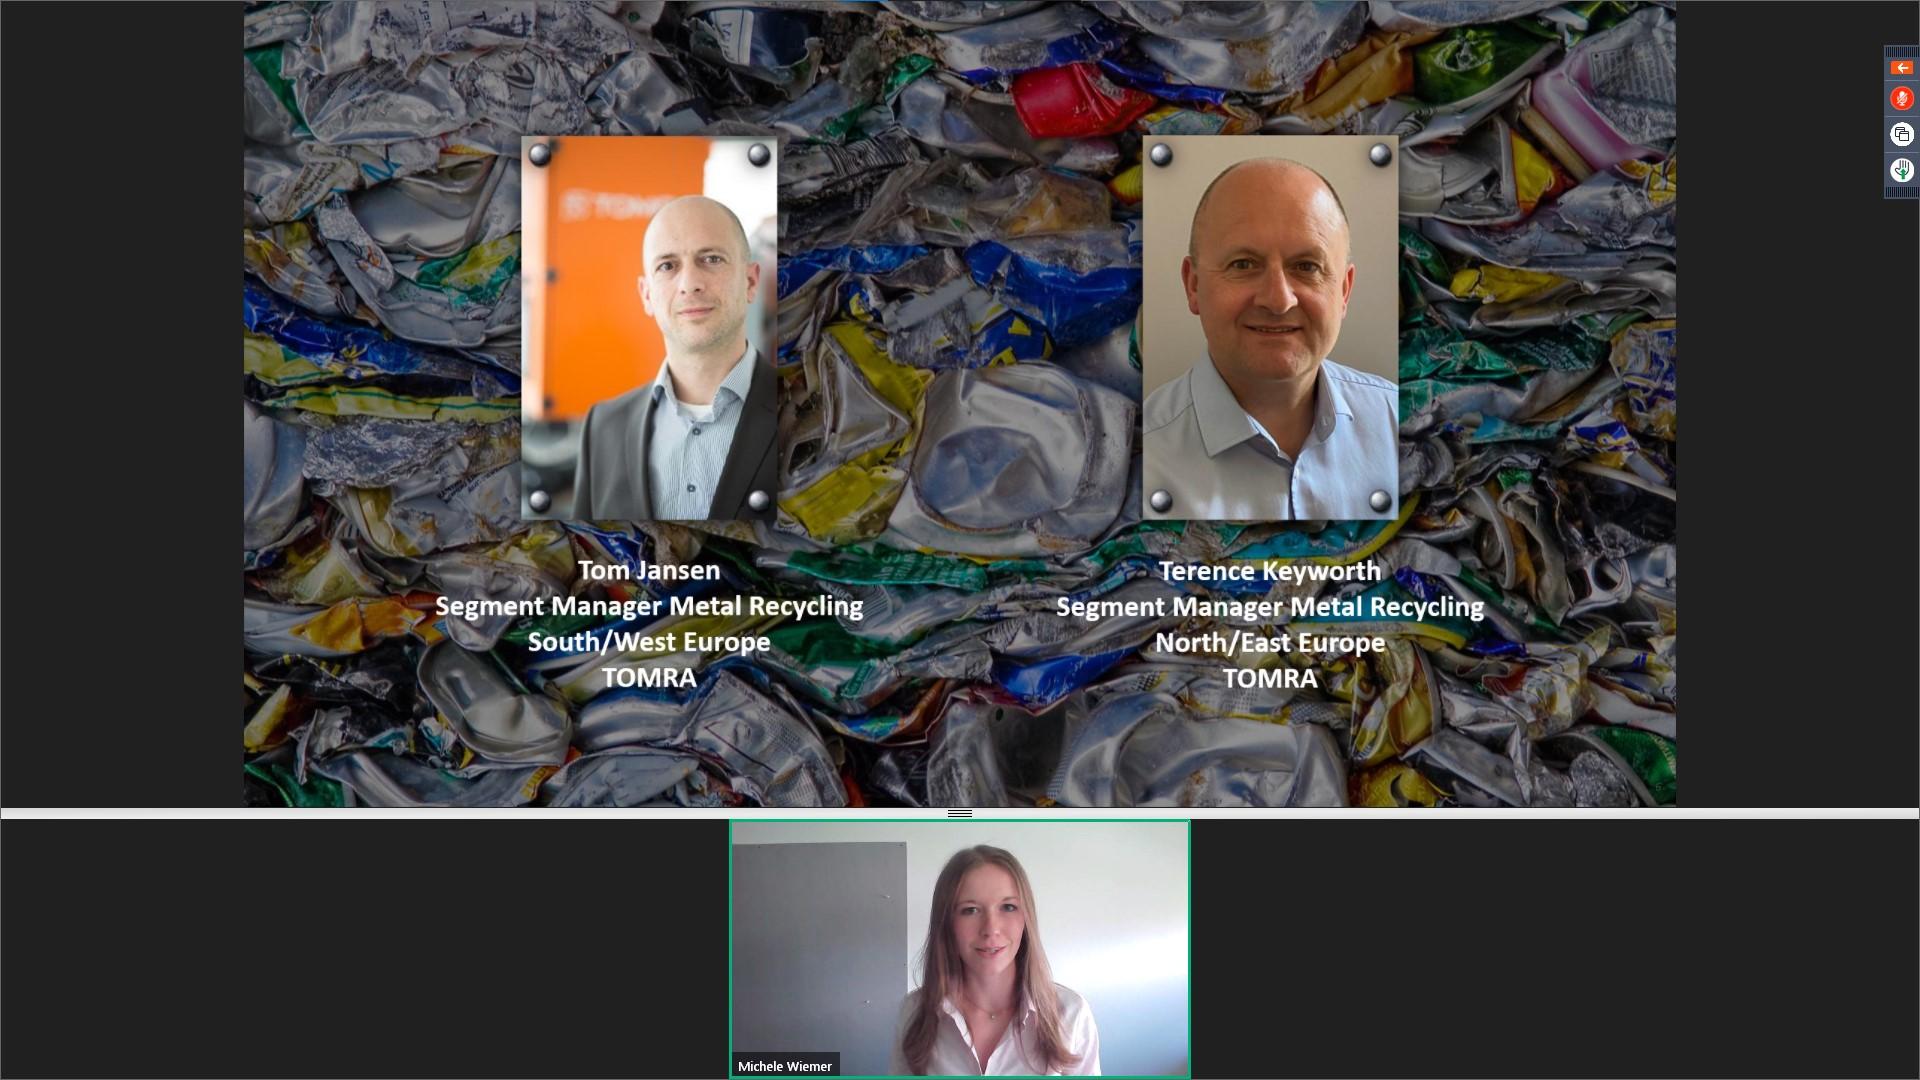 TOMRA_Segement Managers Tom Jansen, Terry Keyworth and host Michèle Wiemer